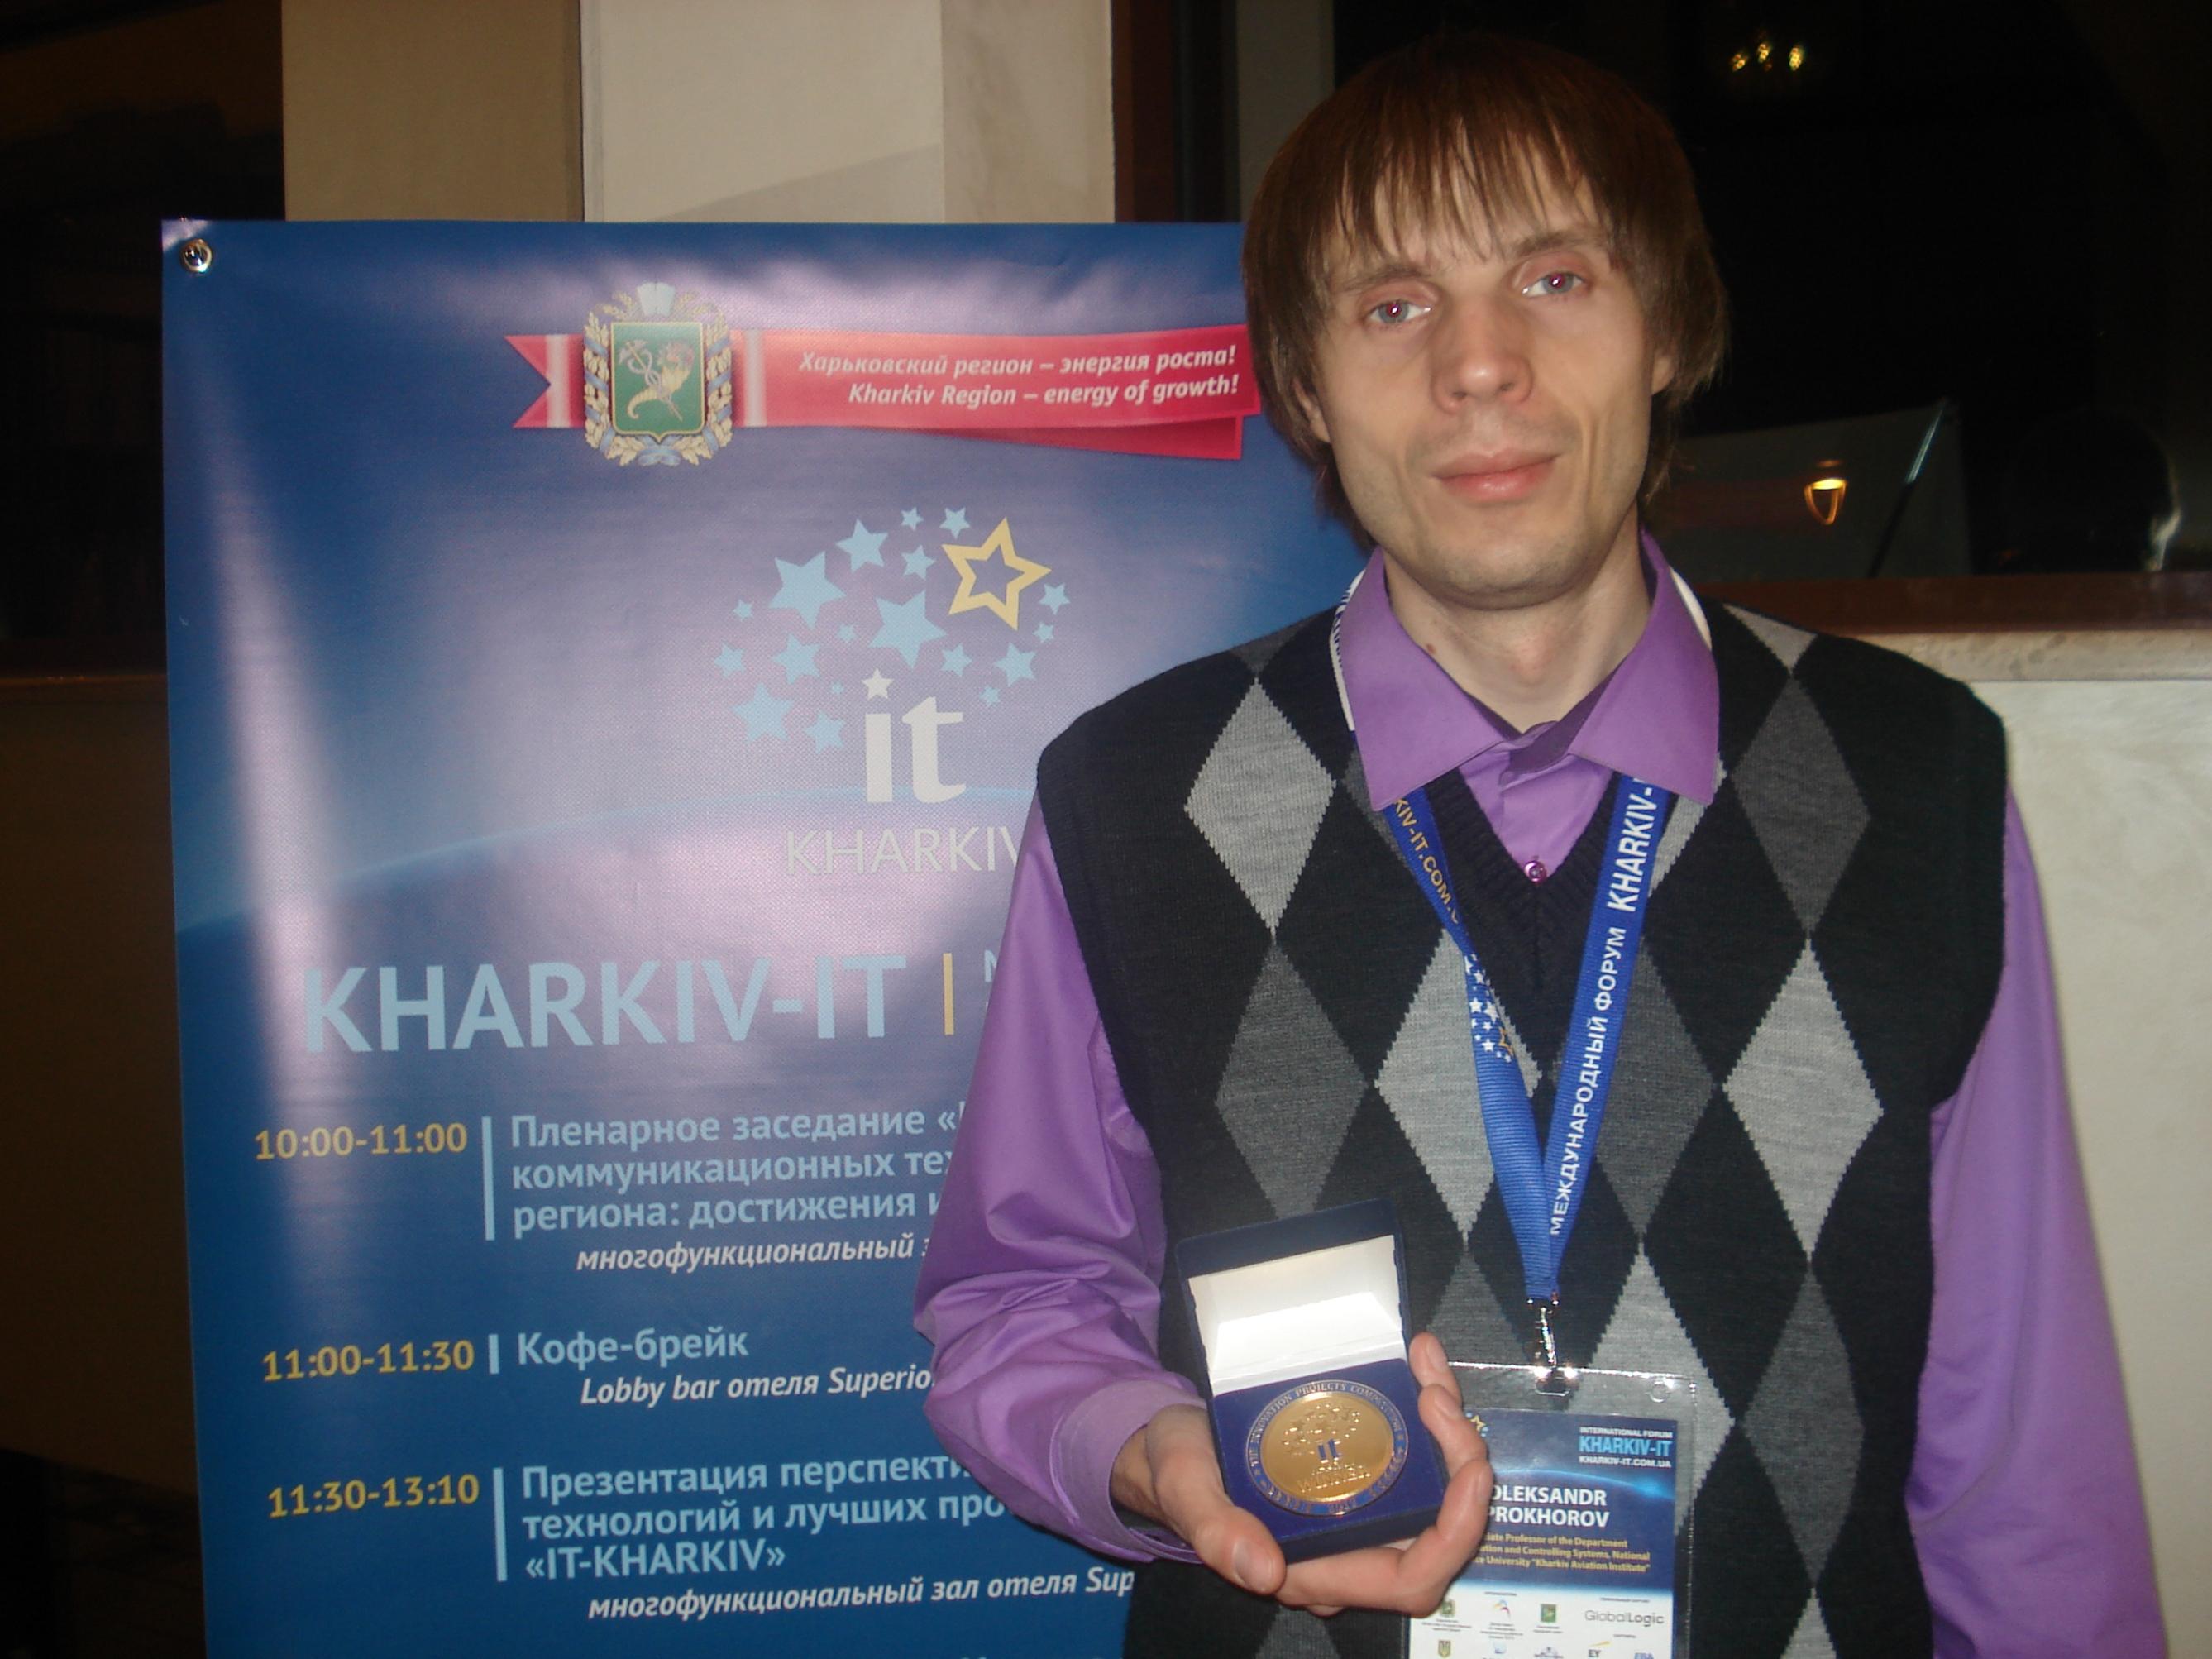 Победа форум Kharkiv-IT 2013